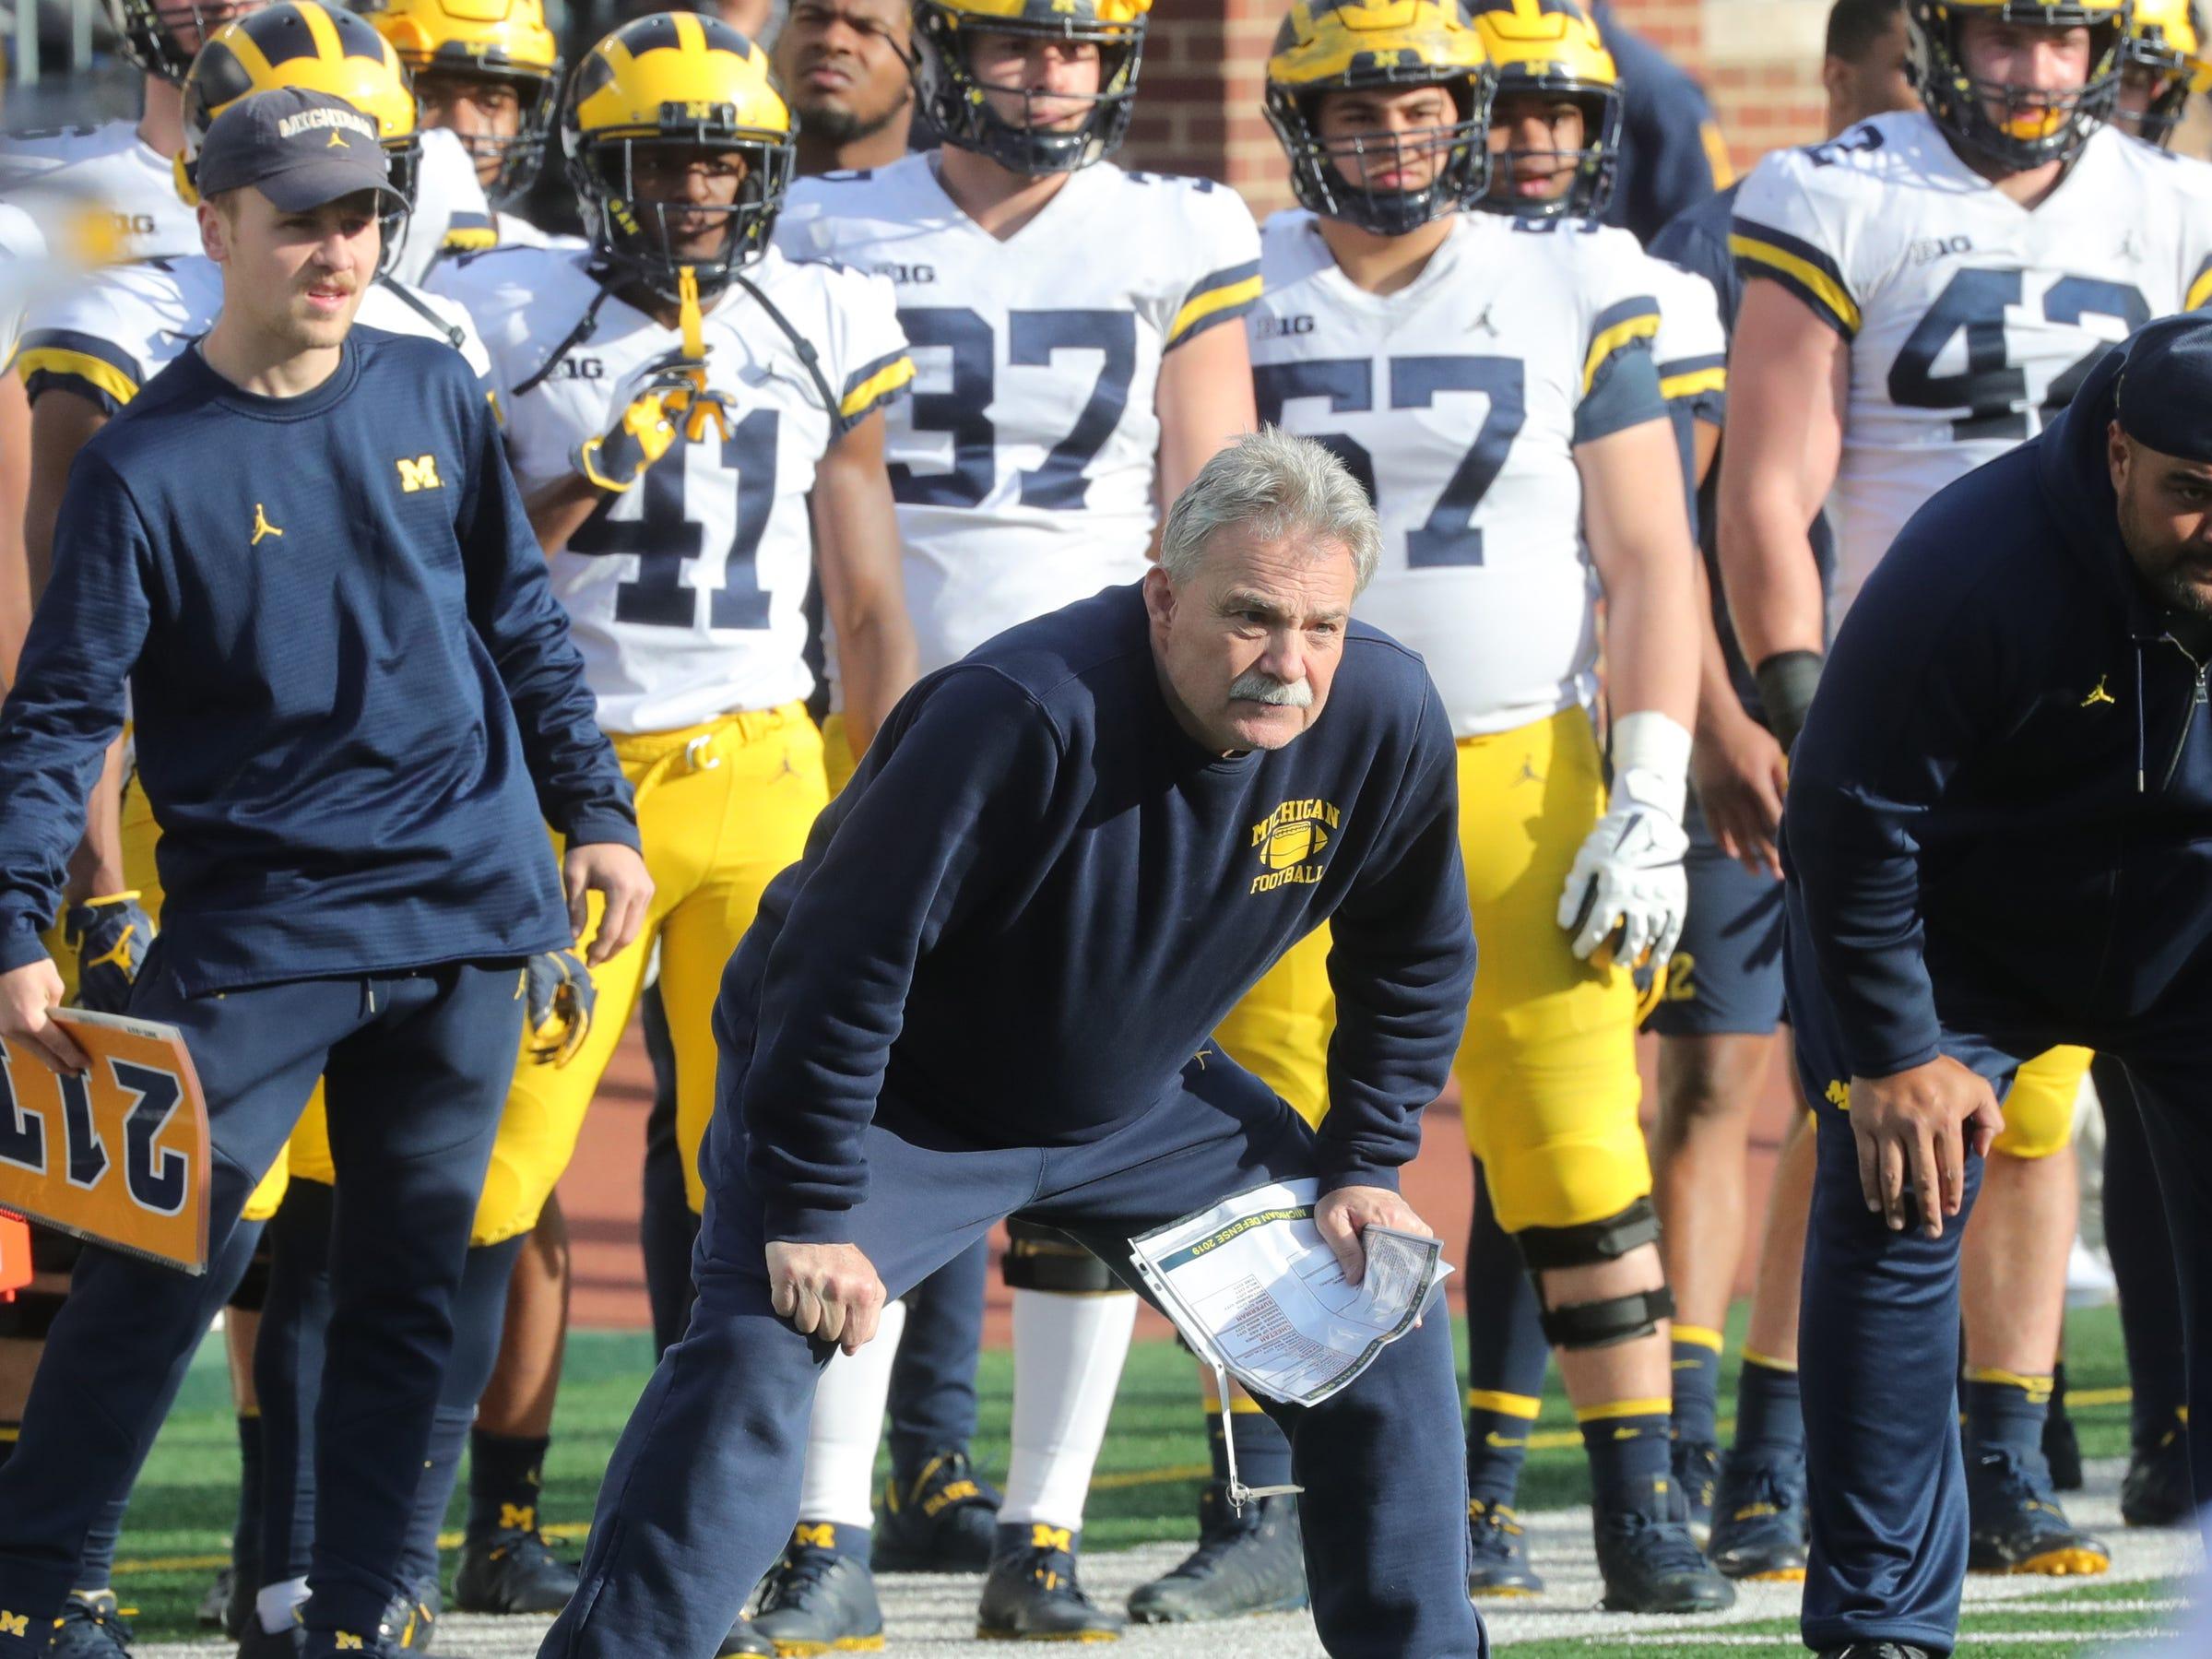 Michigan defensive coordinator Don Brown watches the spring game Saturday, April 13, 2019 at Michigan Stadium in Ann Arbor.